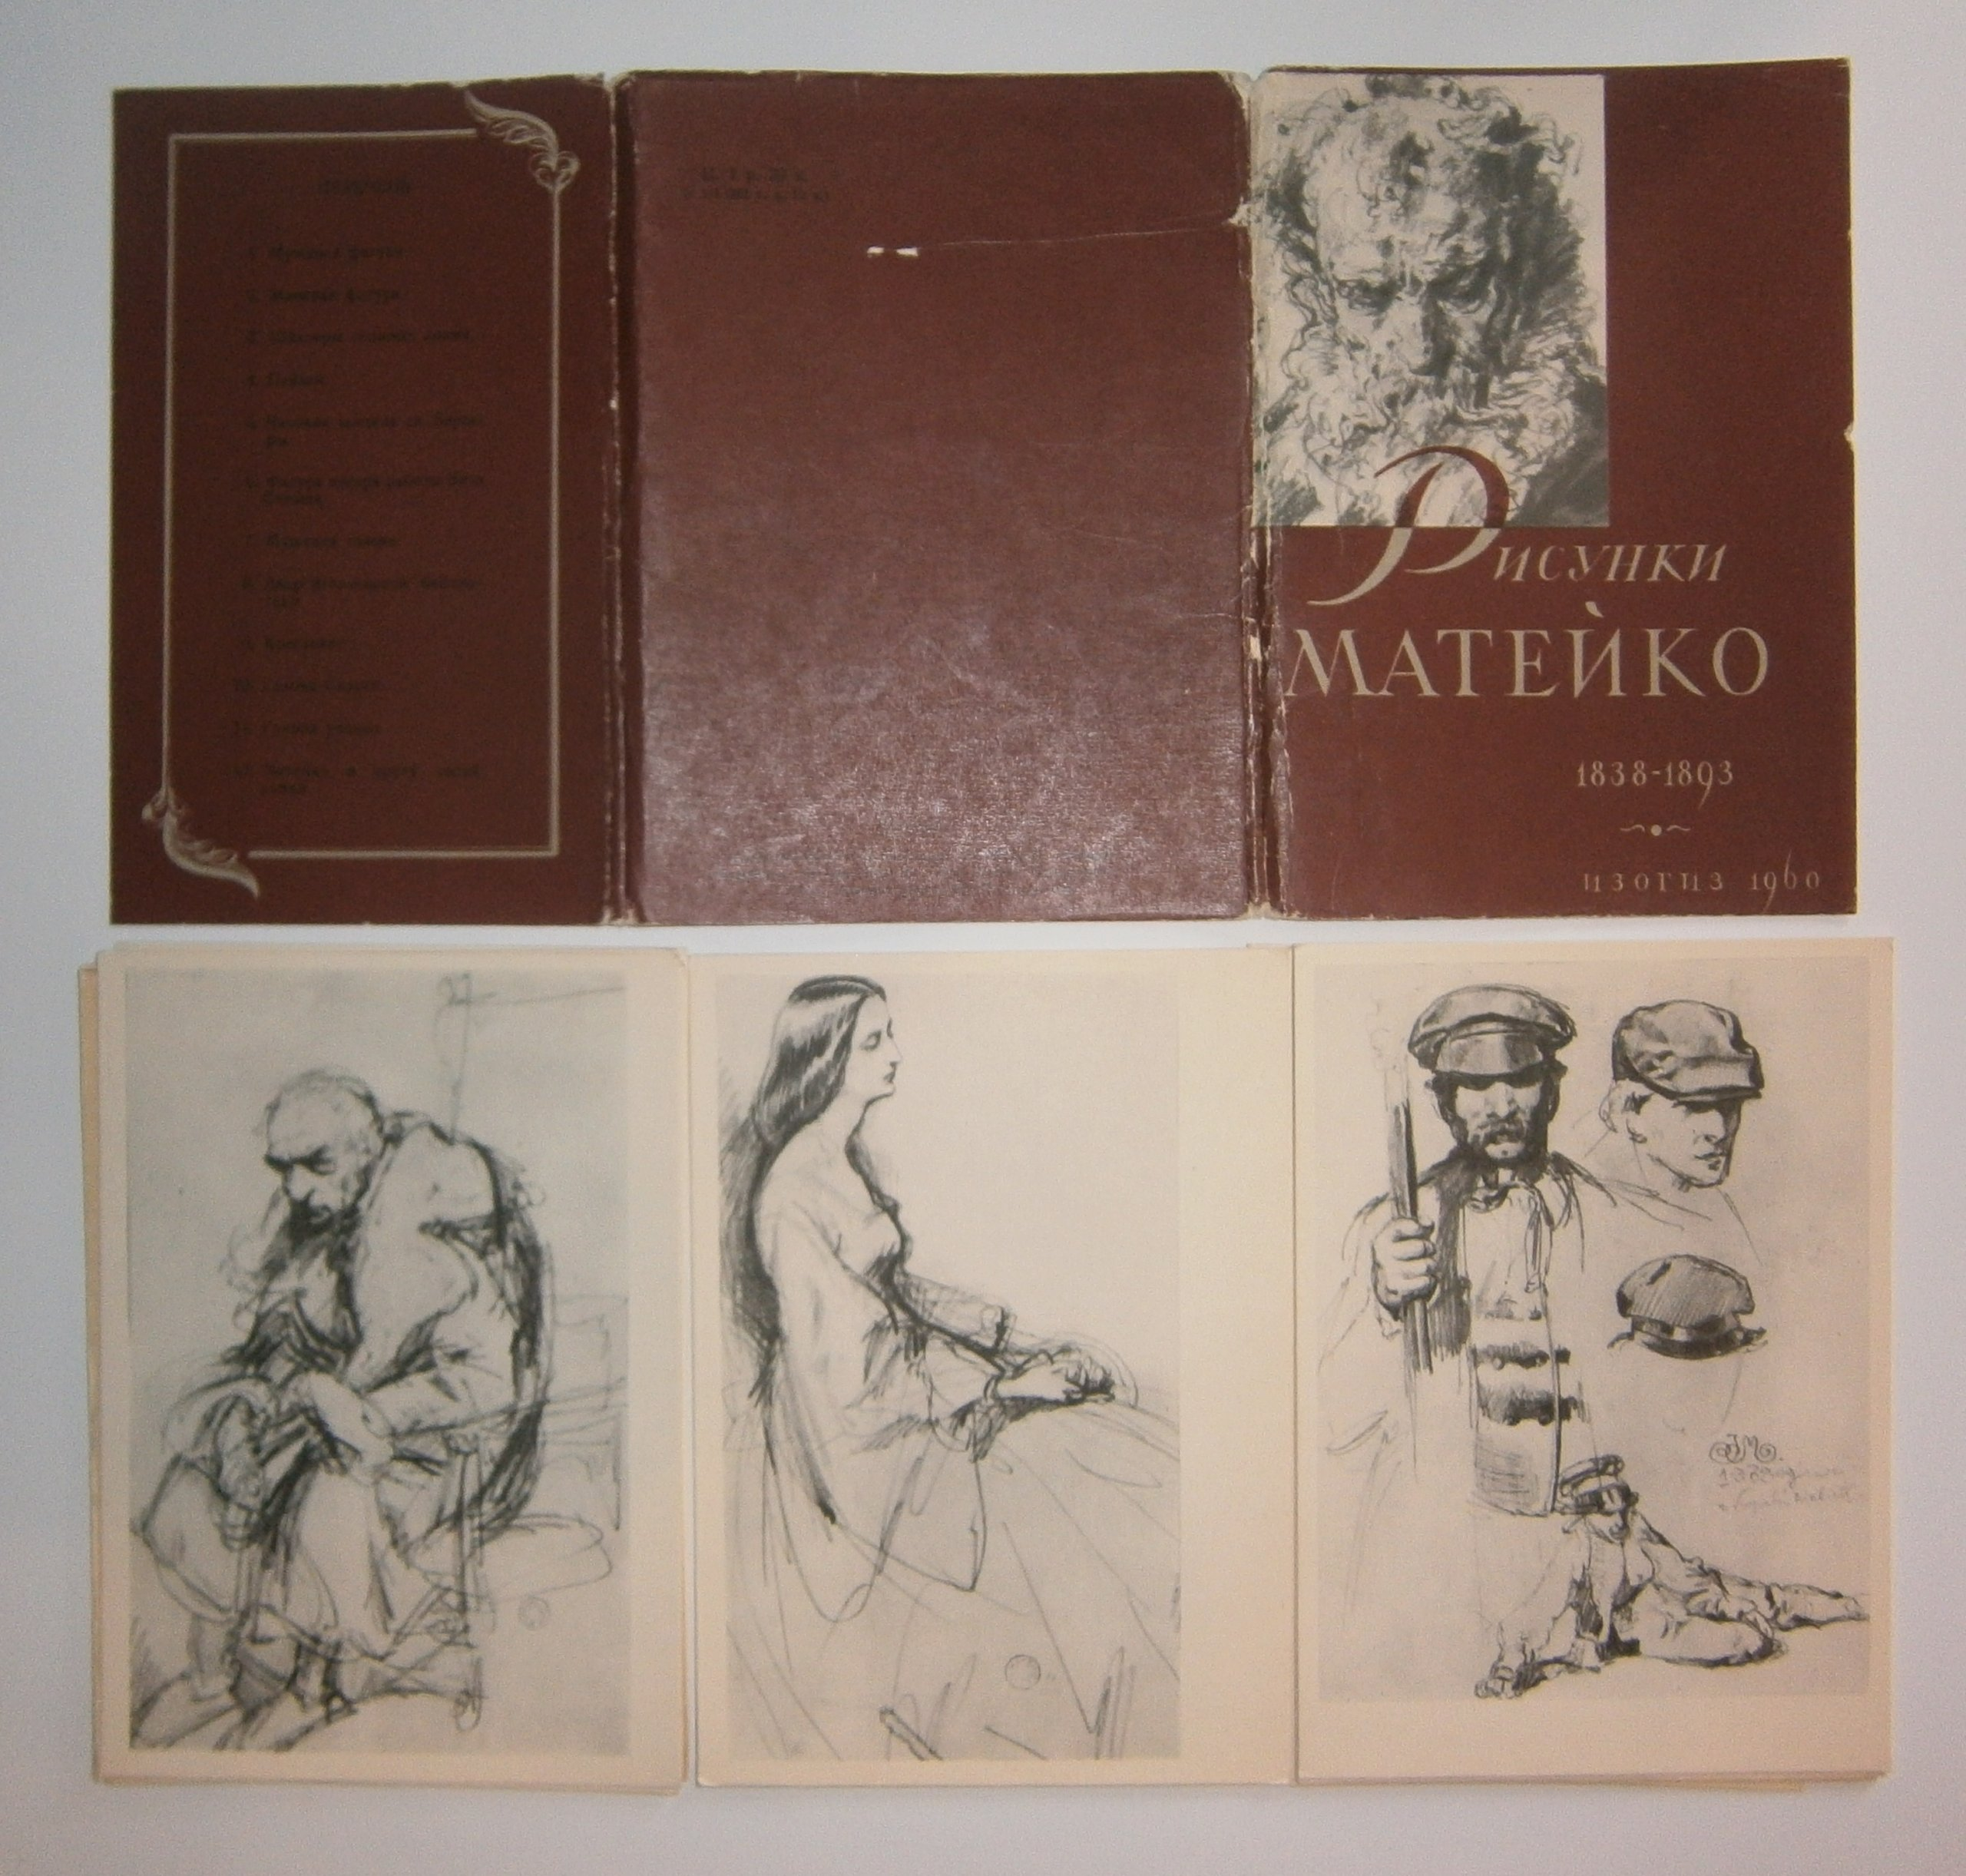 Pohľadnice Matejko